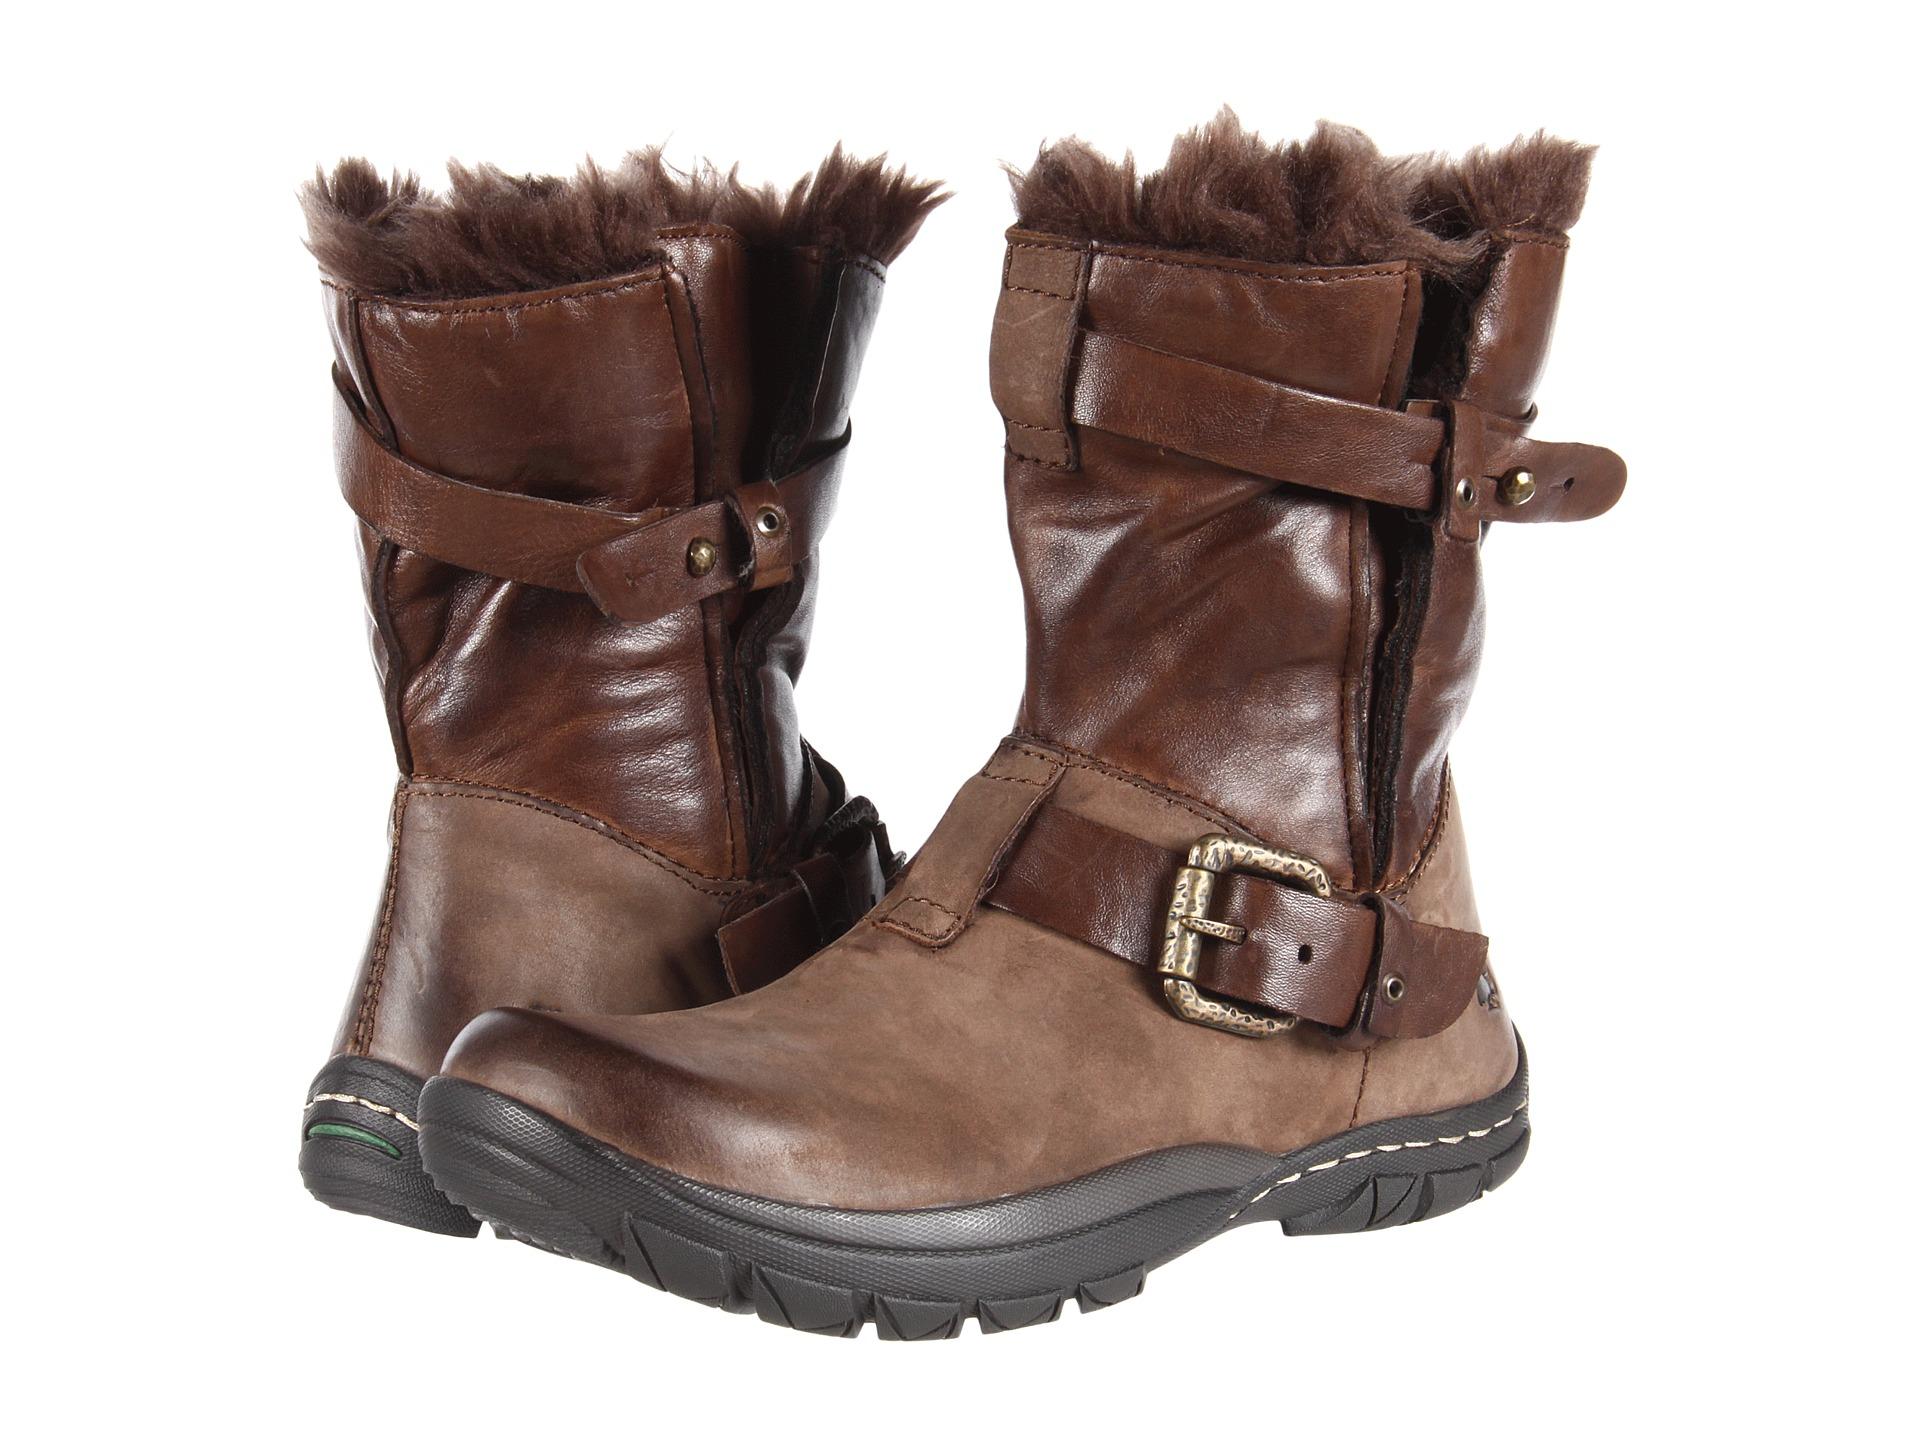 Women's Kalso Earth Shoe Insignia Light Teal Nubuck 181446